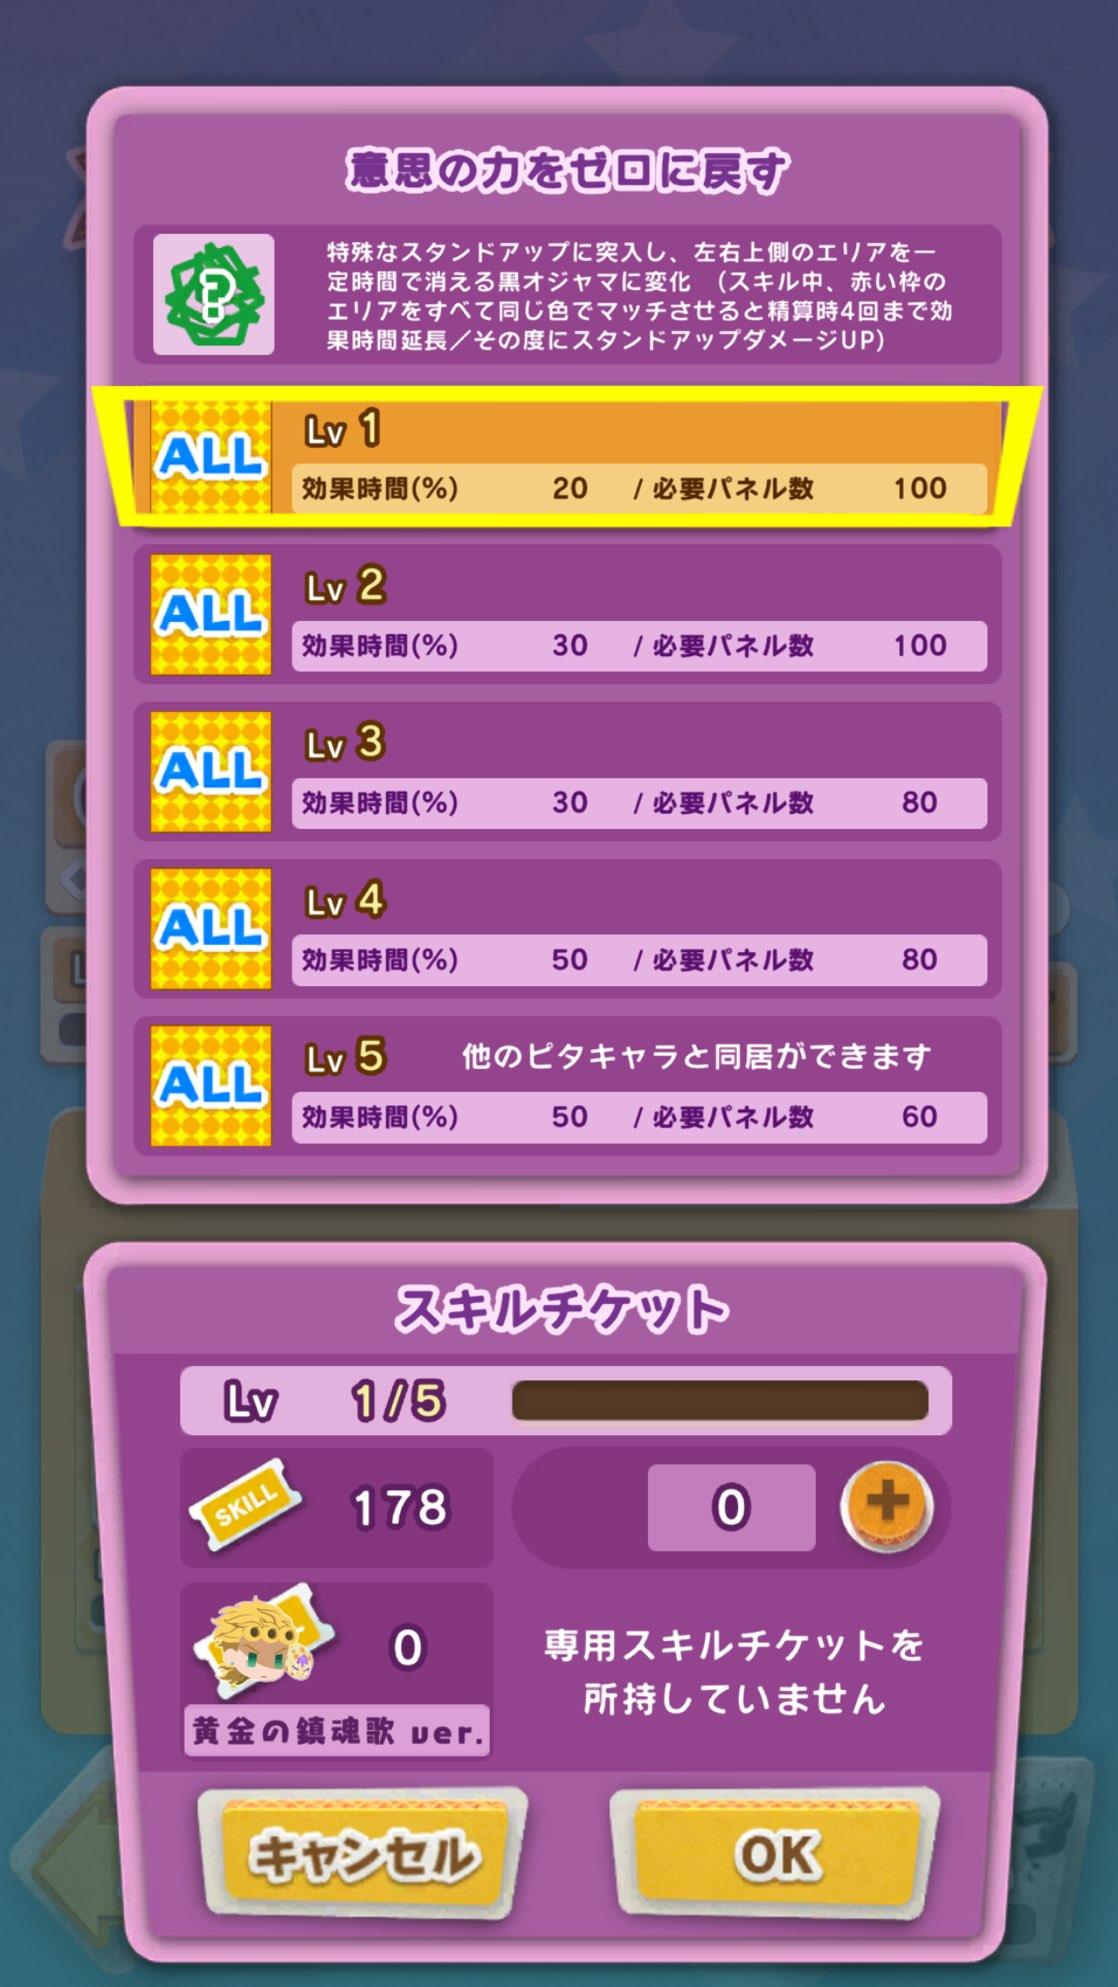 7275A890-F1E0-4934-A54D-E646B4A1048B.jpeg